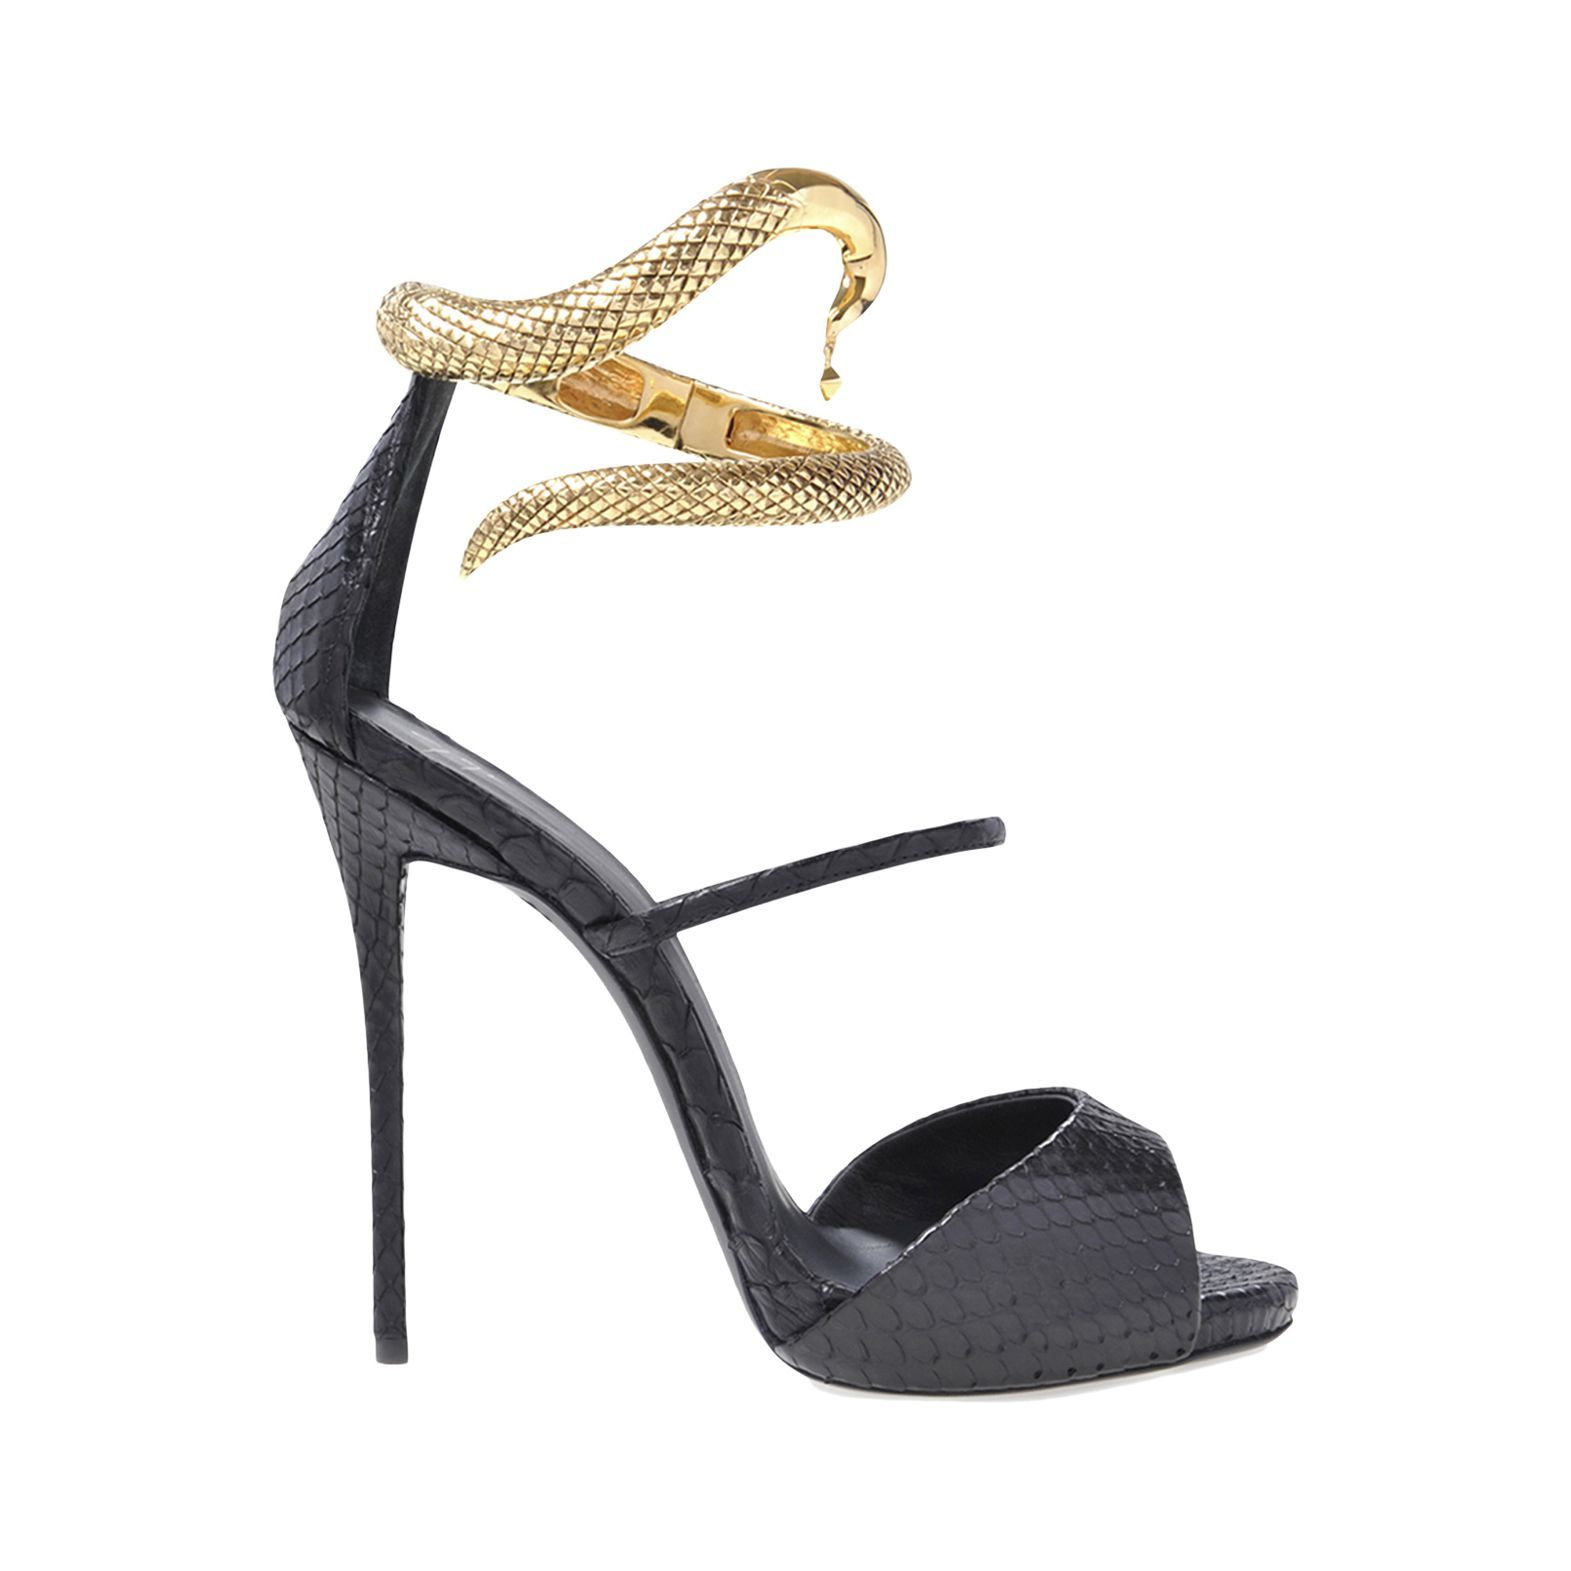 3ec30940d8ef6 e40254 002 - Sandals Women - Shoes Women on Giuseppe Zanotti Design Online  Store United States